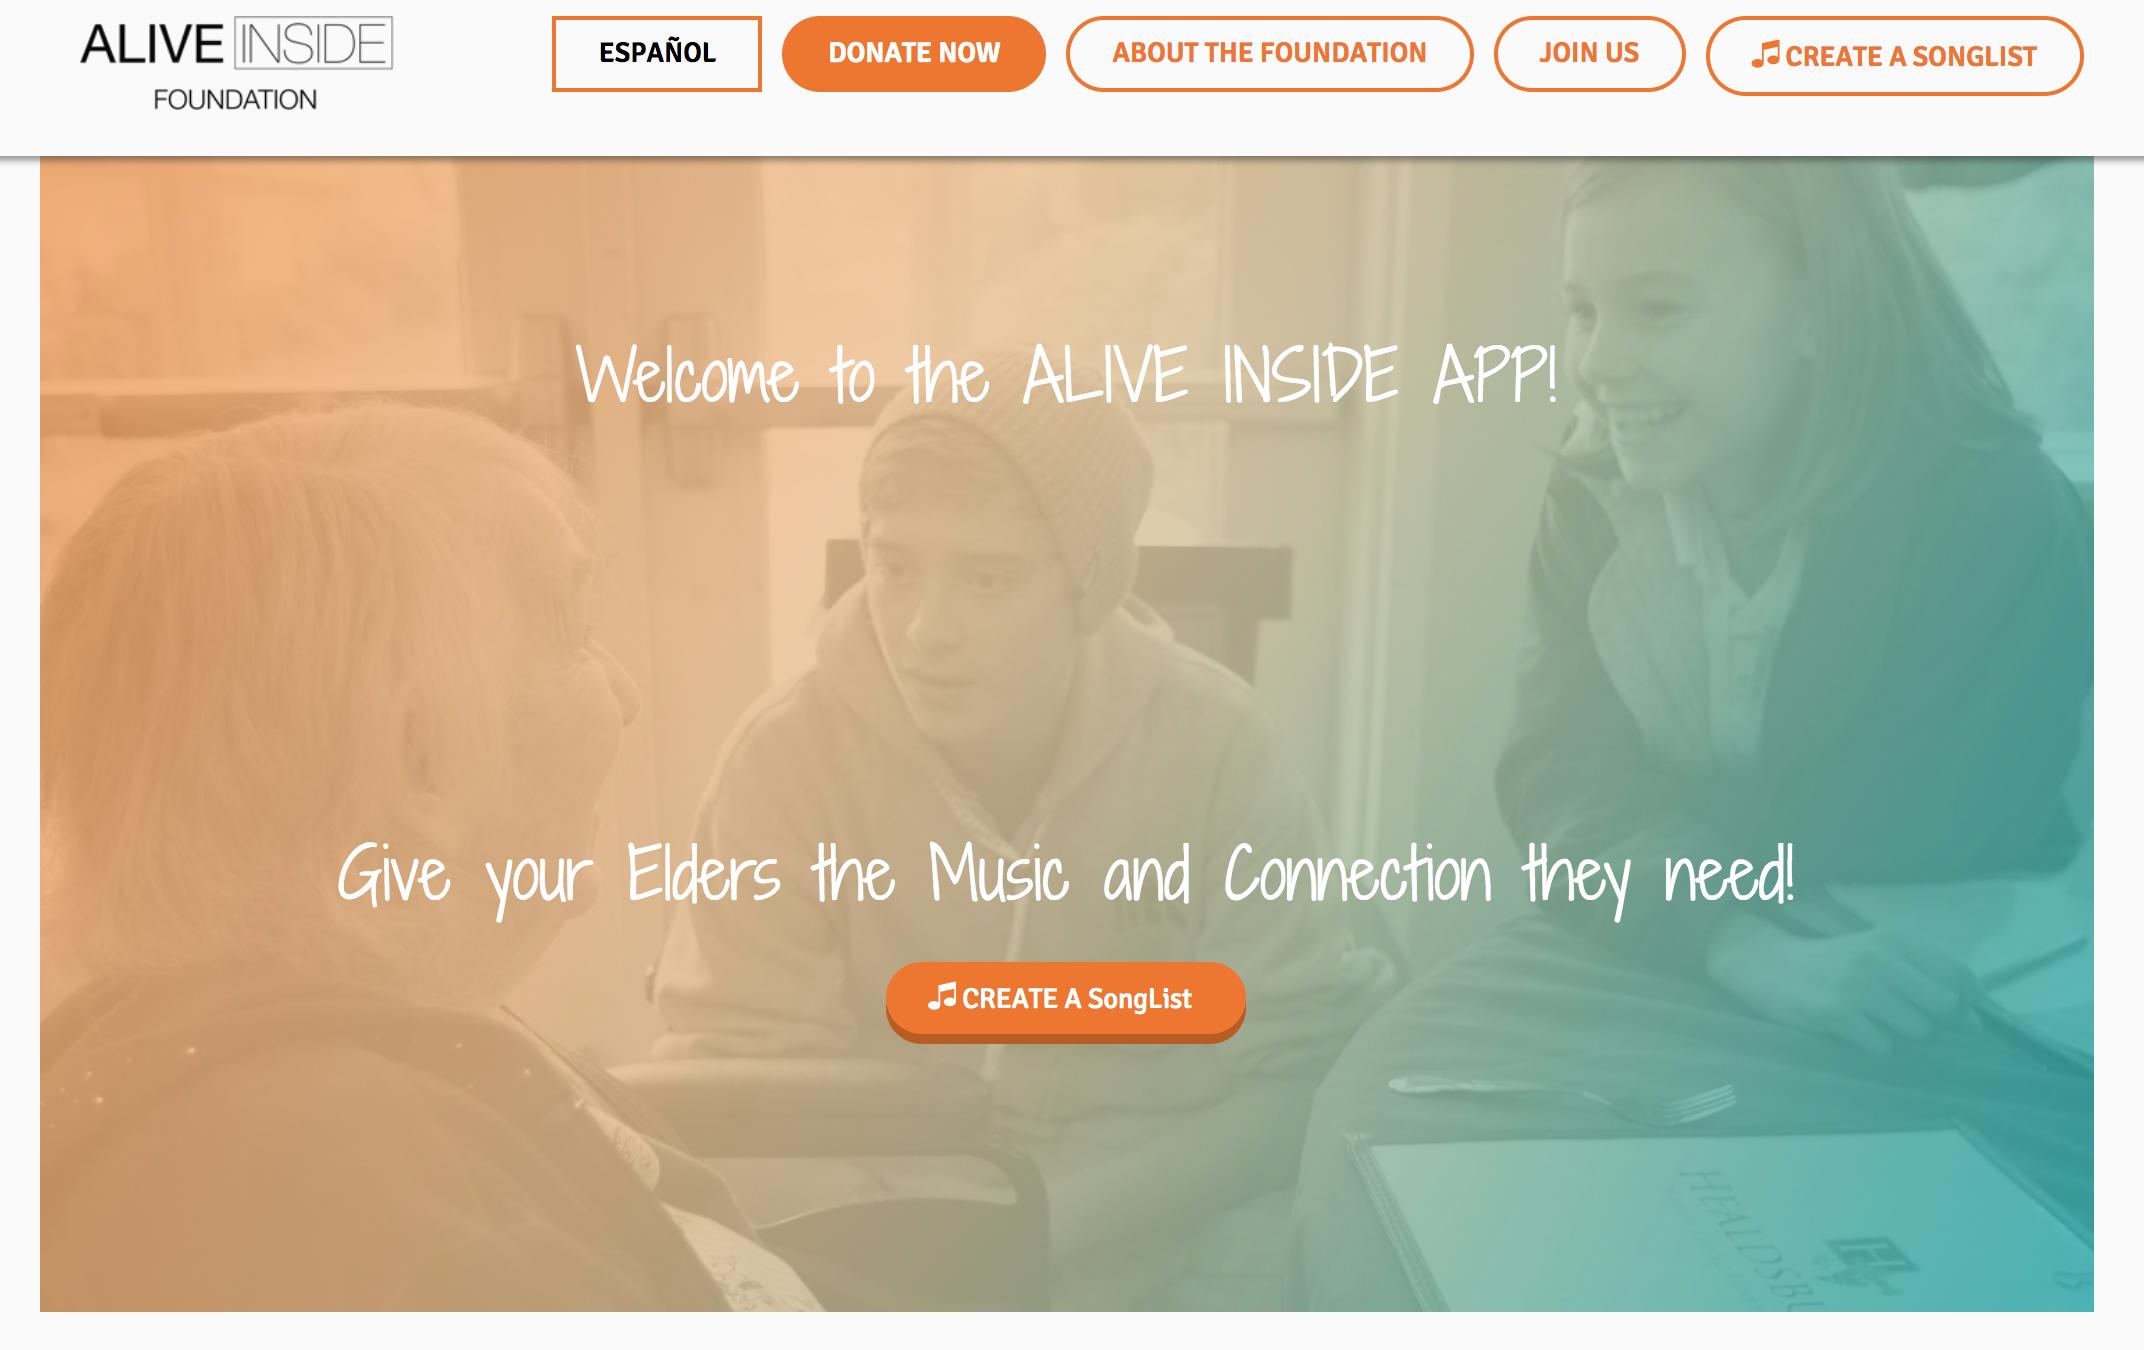 Creating Spotify Playlists - Alive Inside